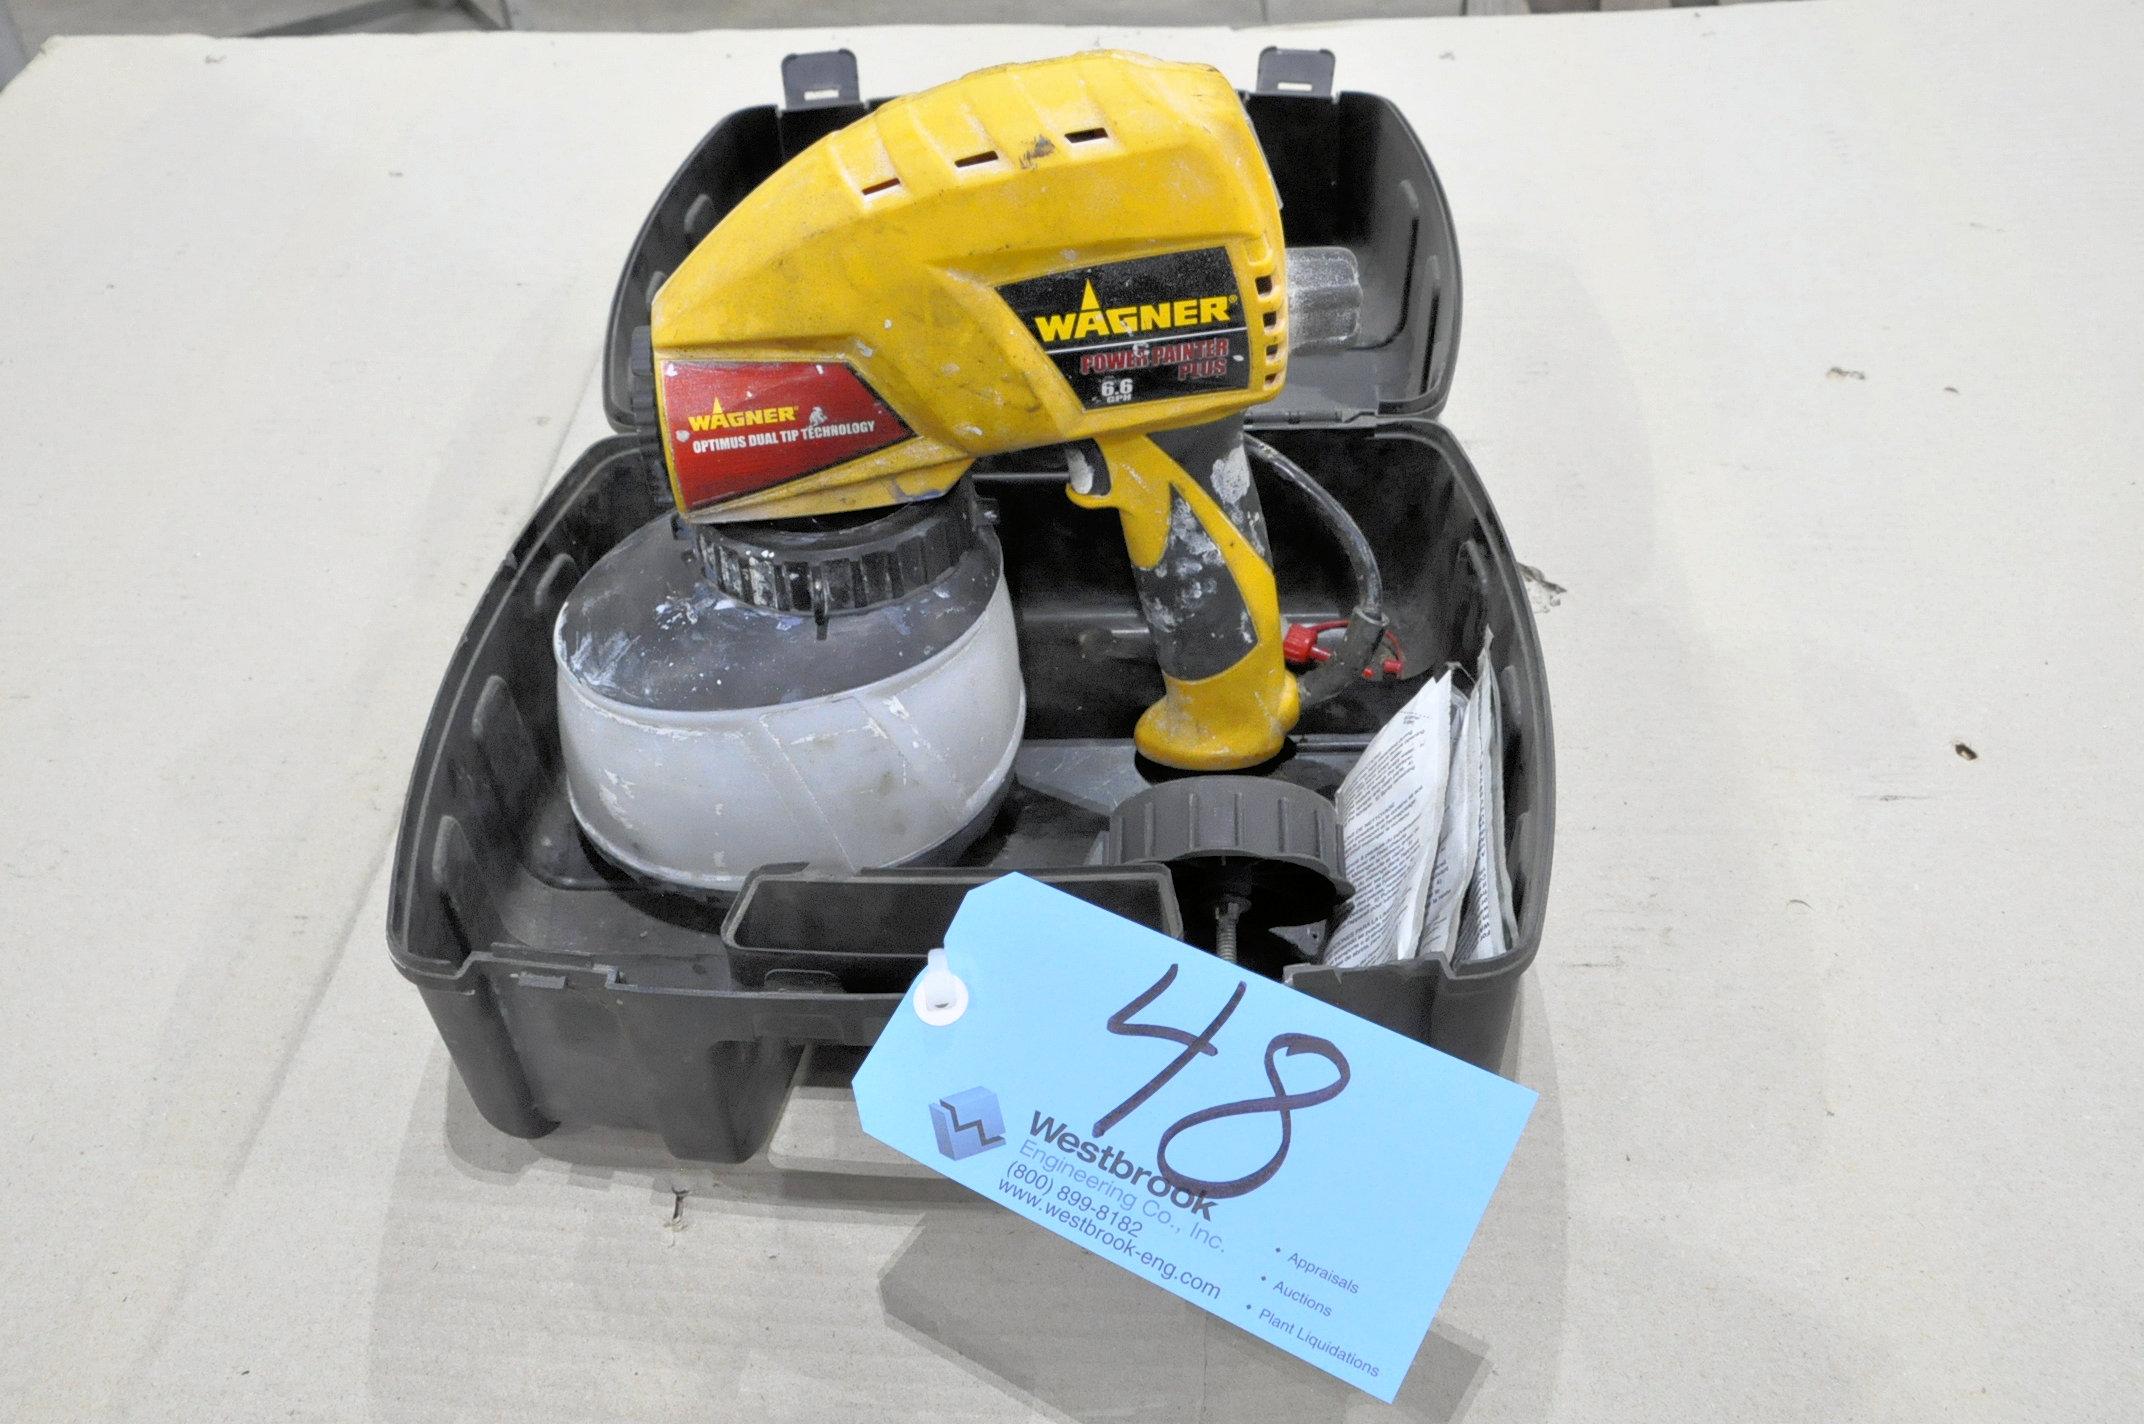 Wagner Power Painter Plus, 6.6 GPH Electric Airless Hand Held Sprayer